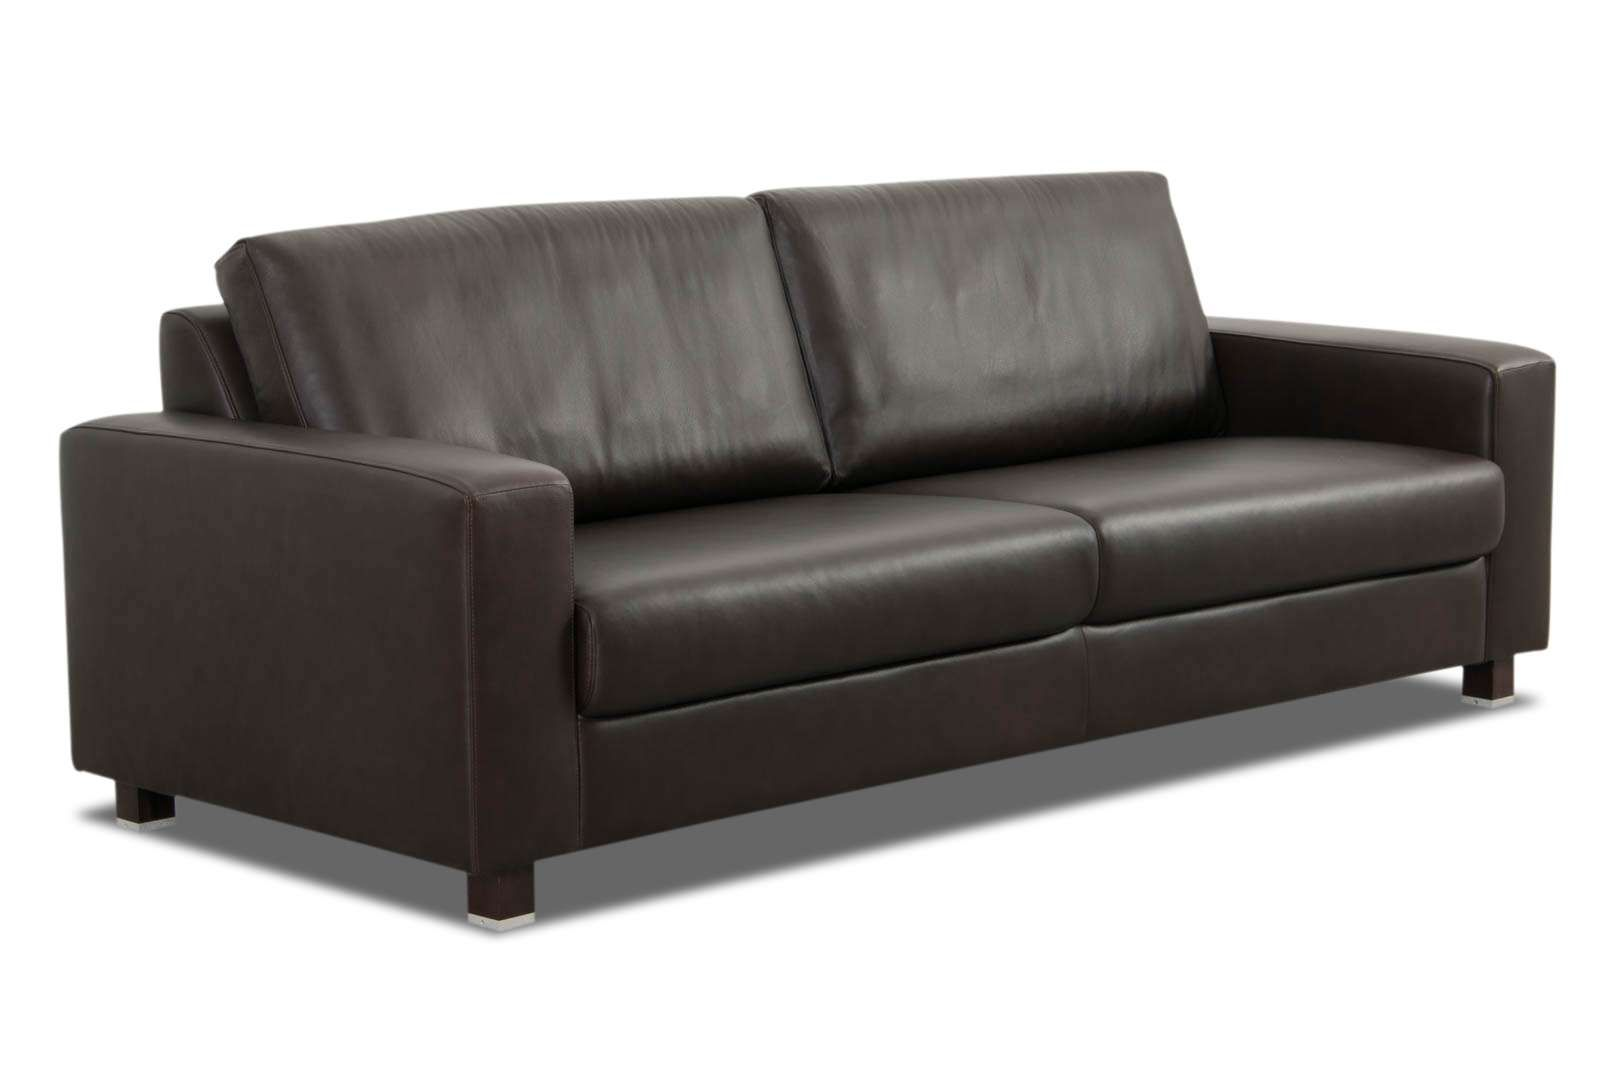 sofa ewald schillig flex plus. Black Bedroom Furniture Sets. Home Design Ideas